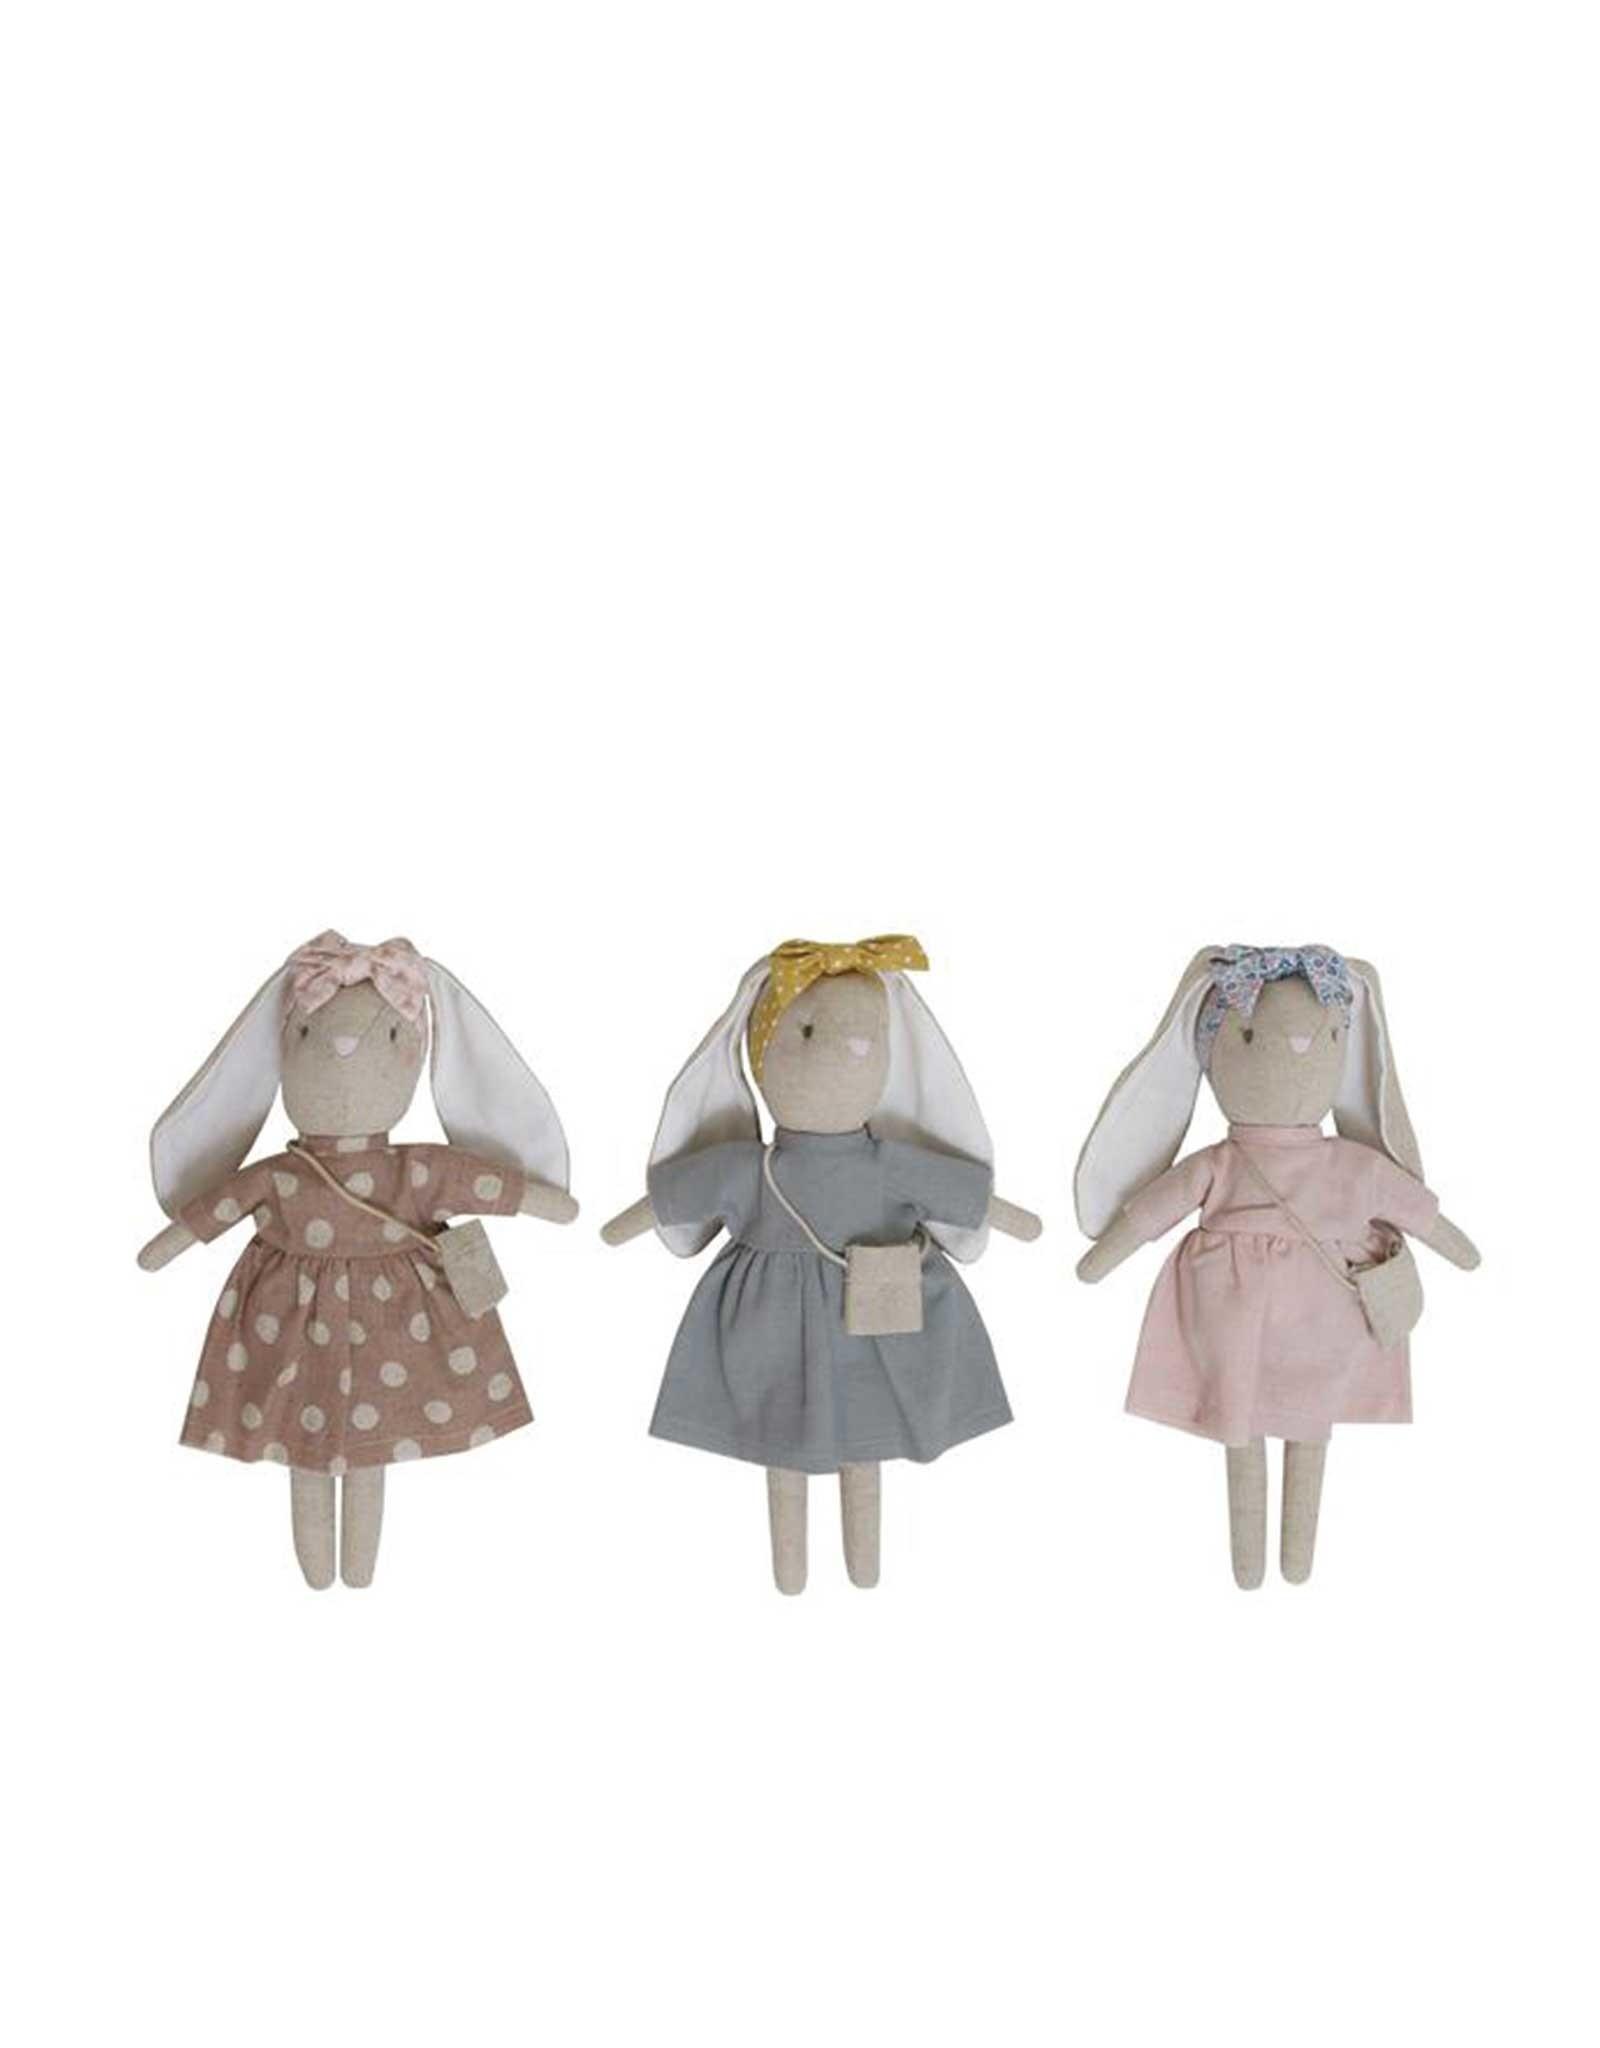 Alimrose Poupée en lin - Mini Sofia la lapine robe grise